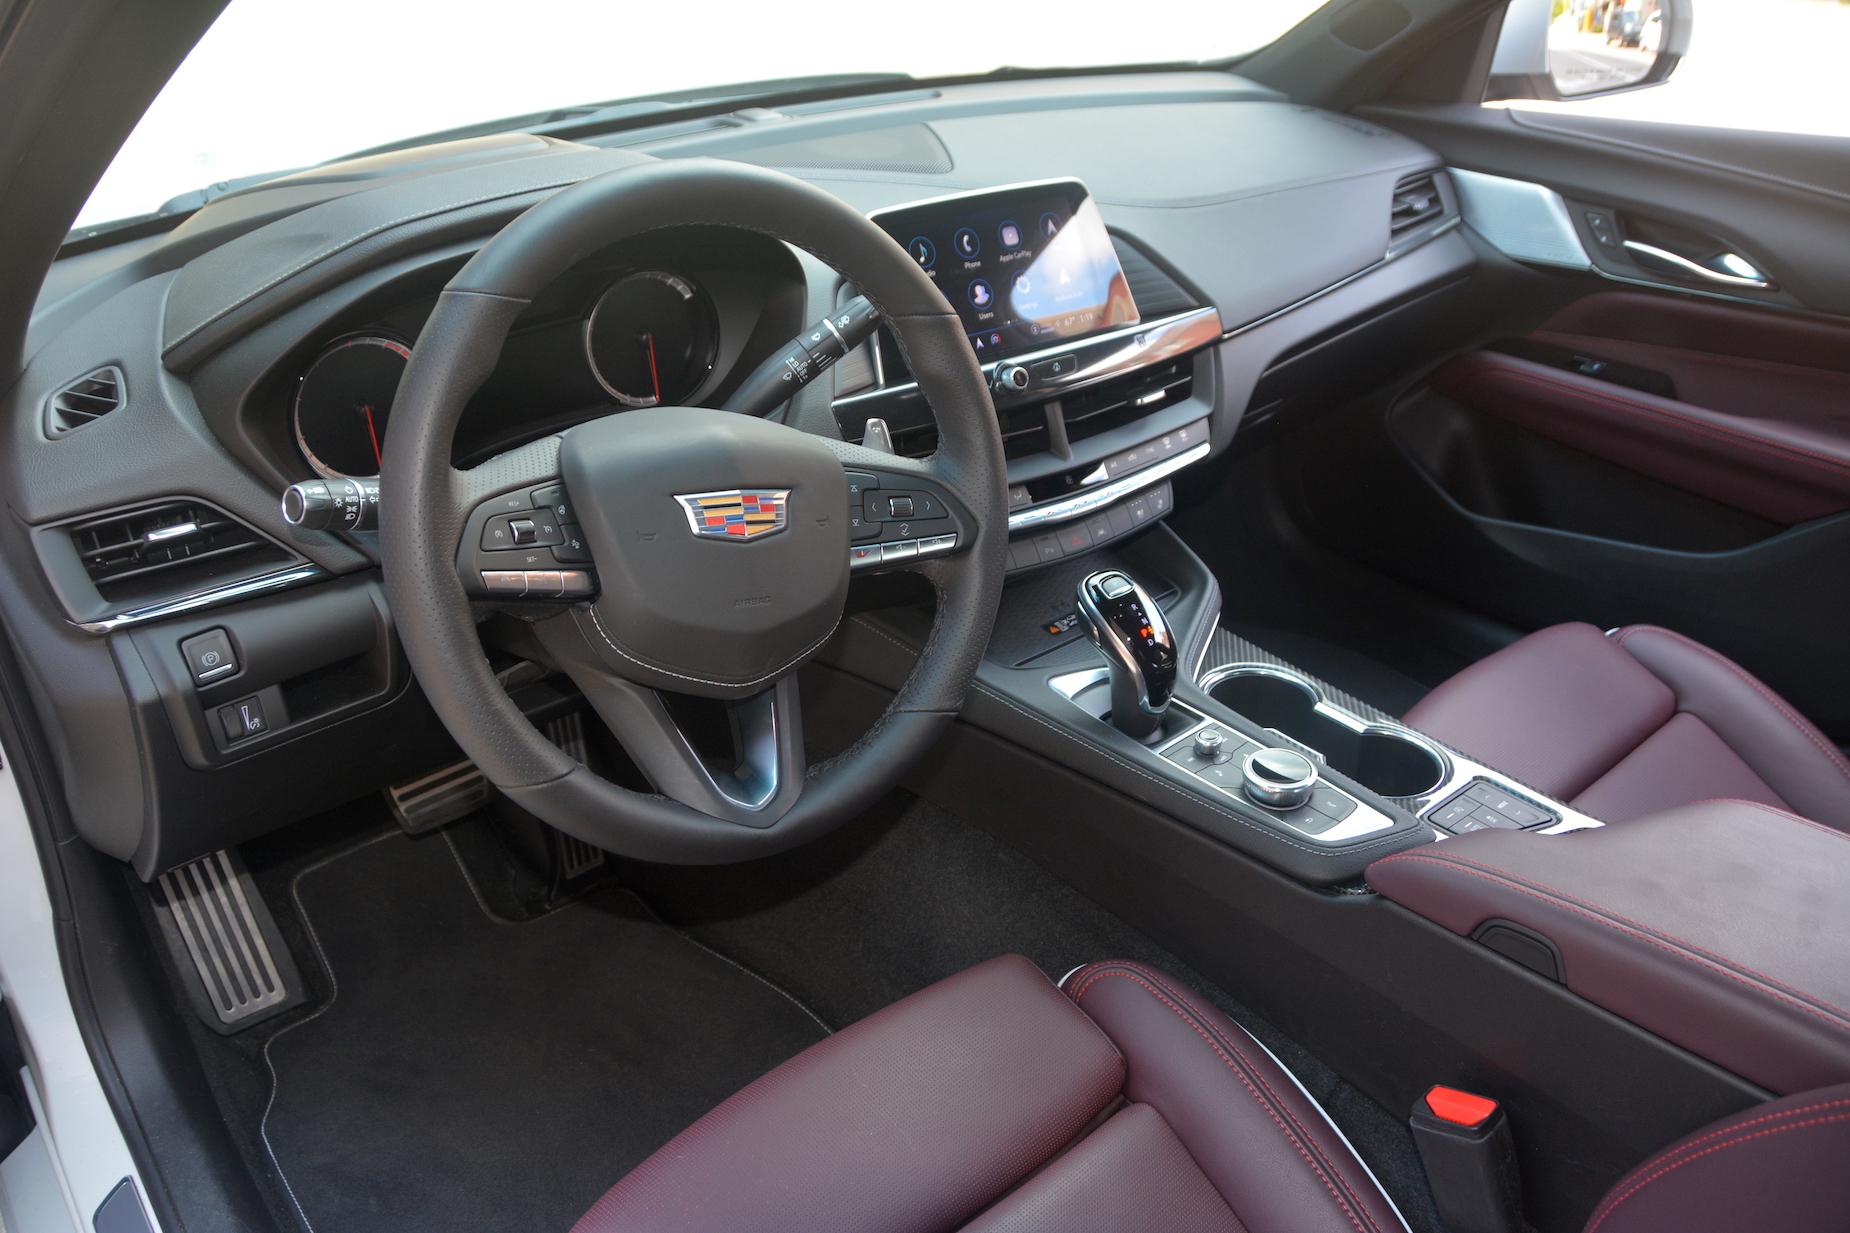 2021 Cadillac CT4-V steering wheel